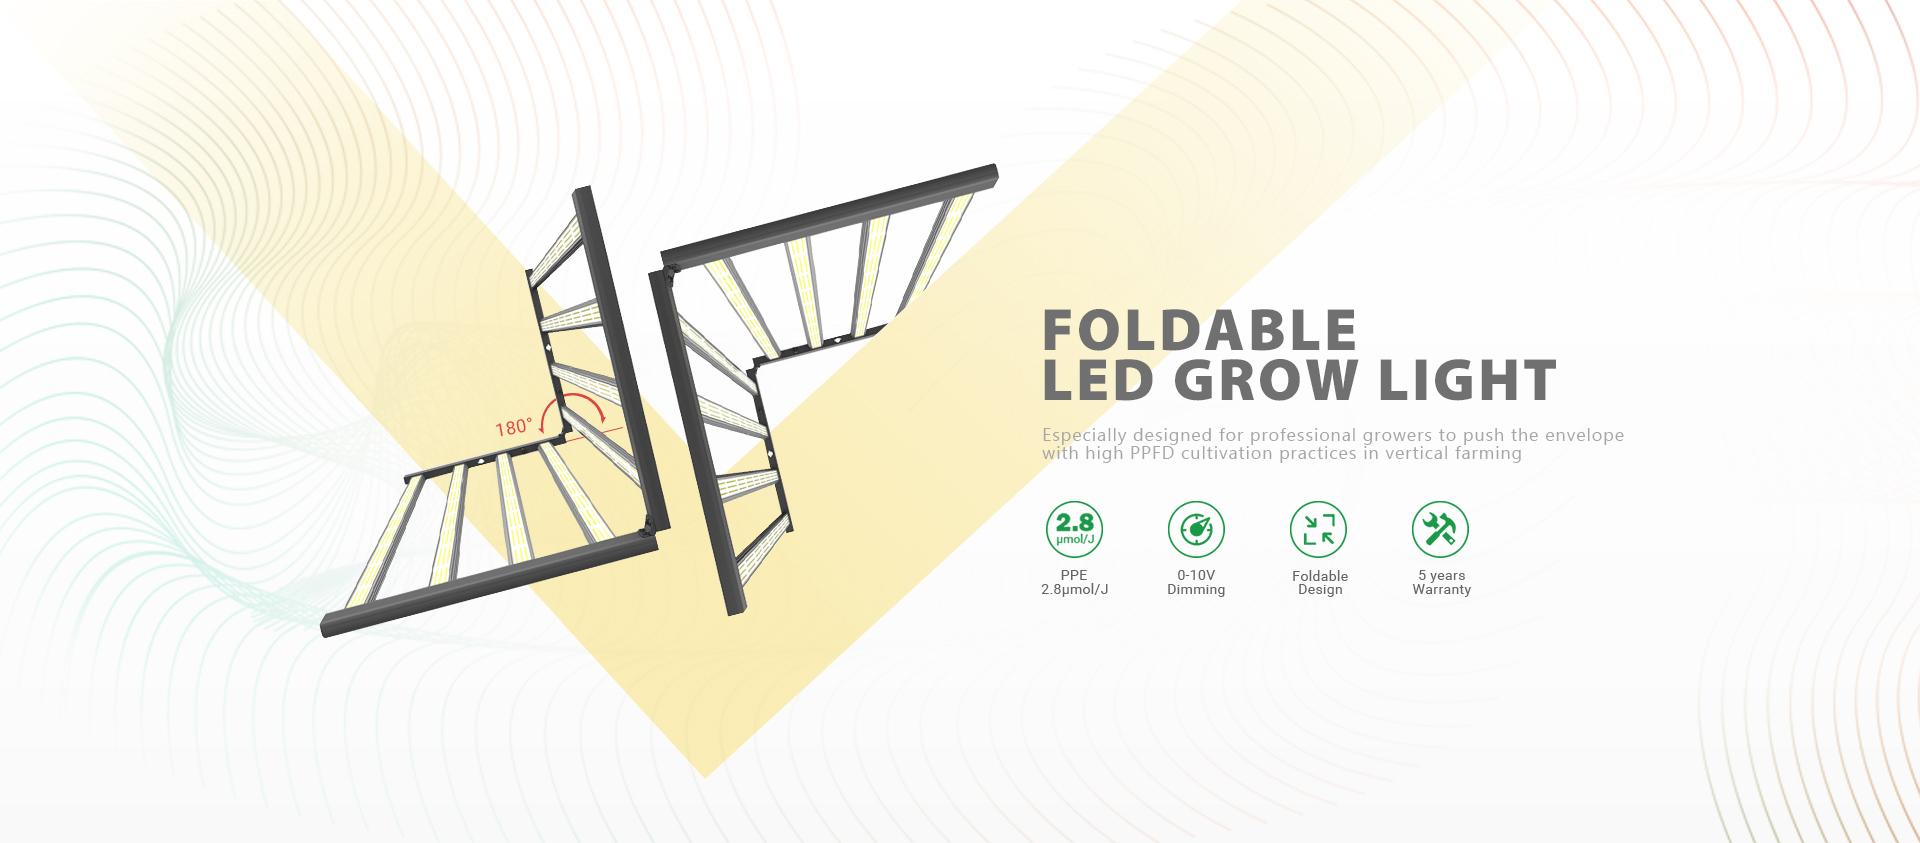 MF3 LED GROW LIGHT